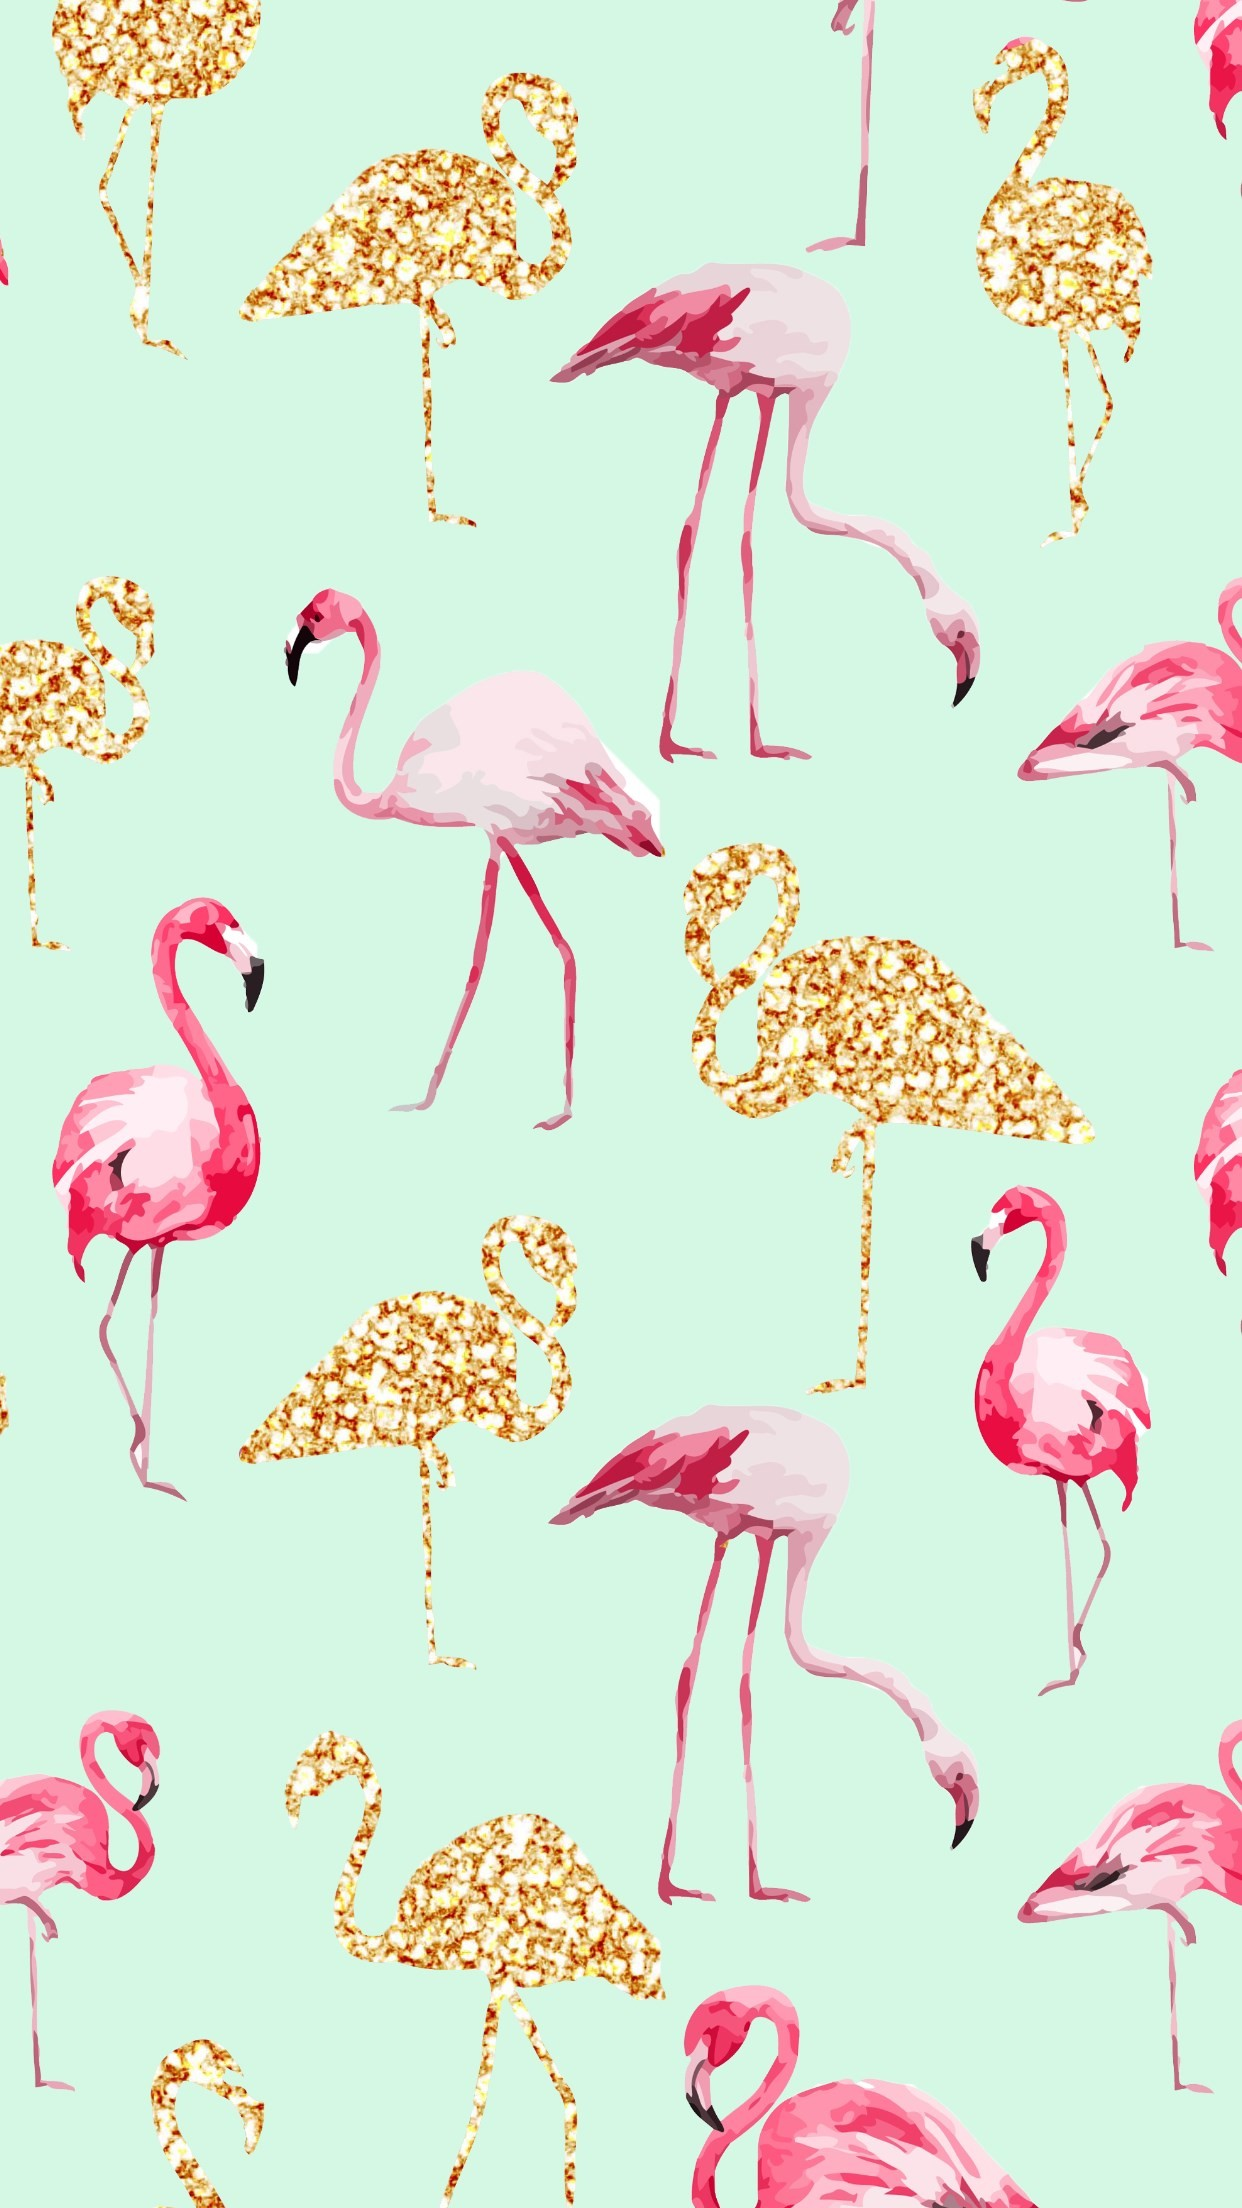 Kate Spade Wallpaper (57+ images)